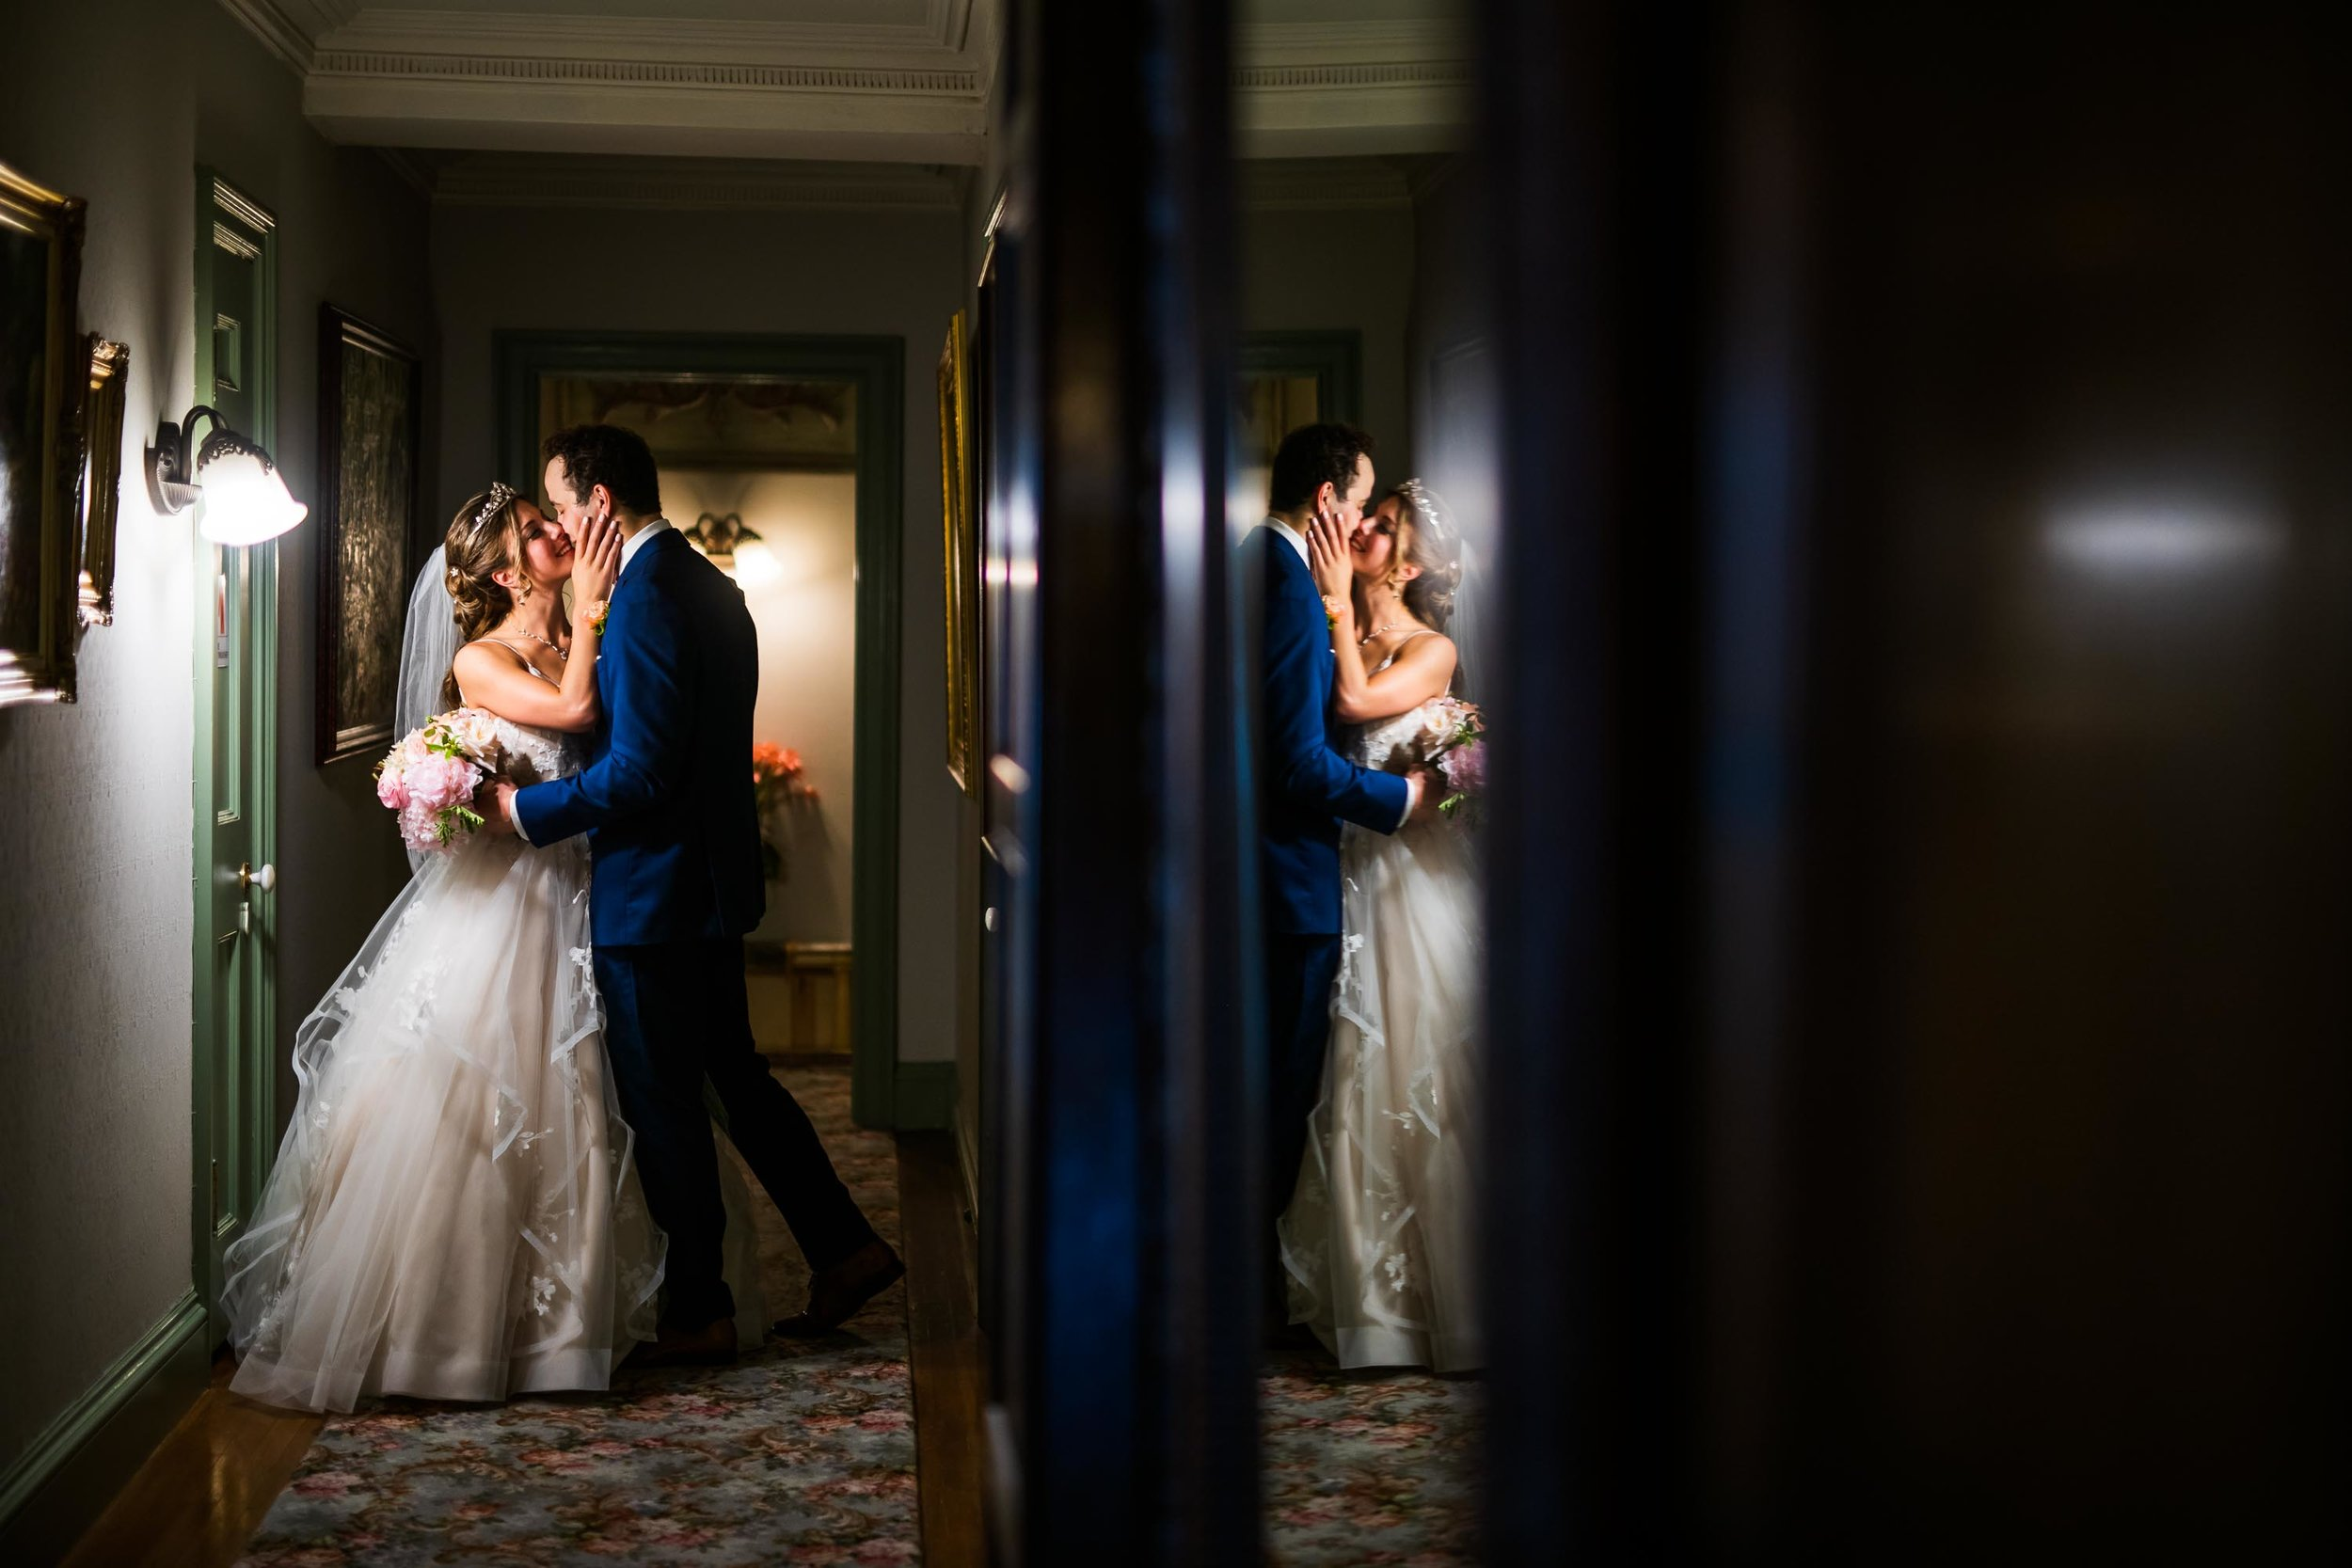 thornewood castle wedding 40.jpg